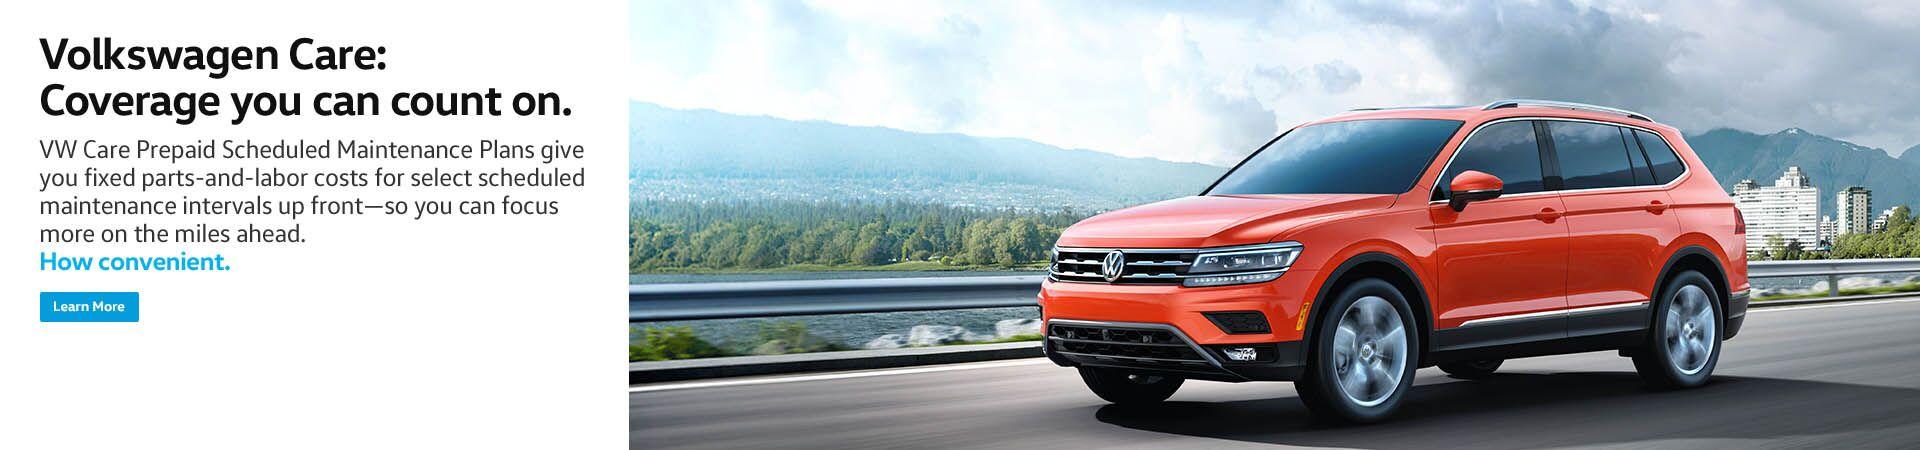 Volkswagen Dealership Racine Wi Used Cars Frank Boucher